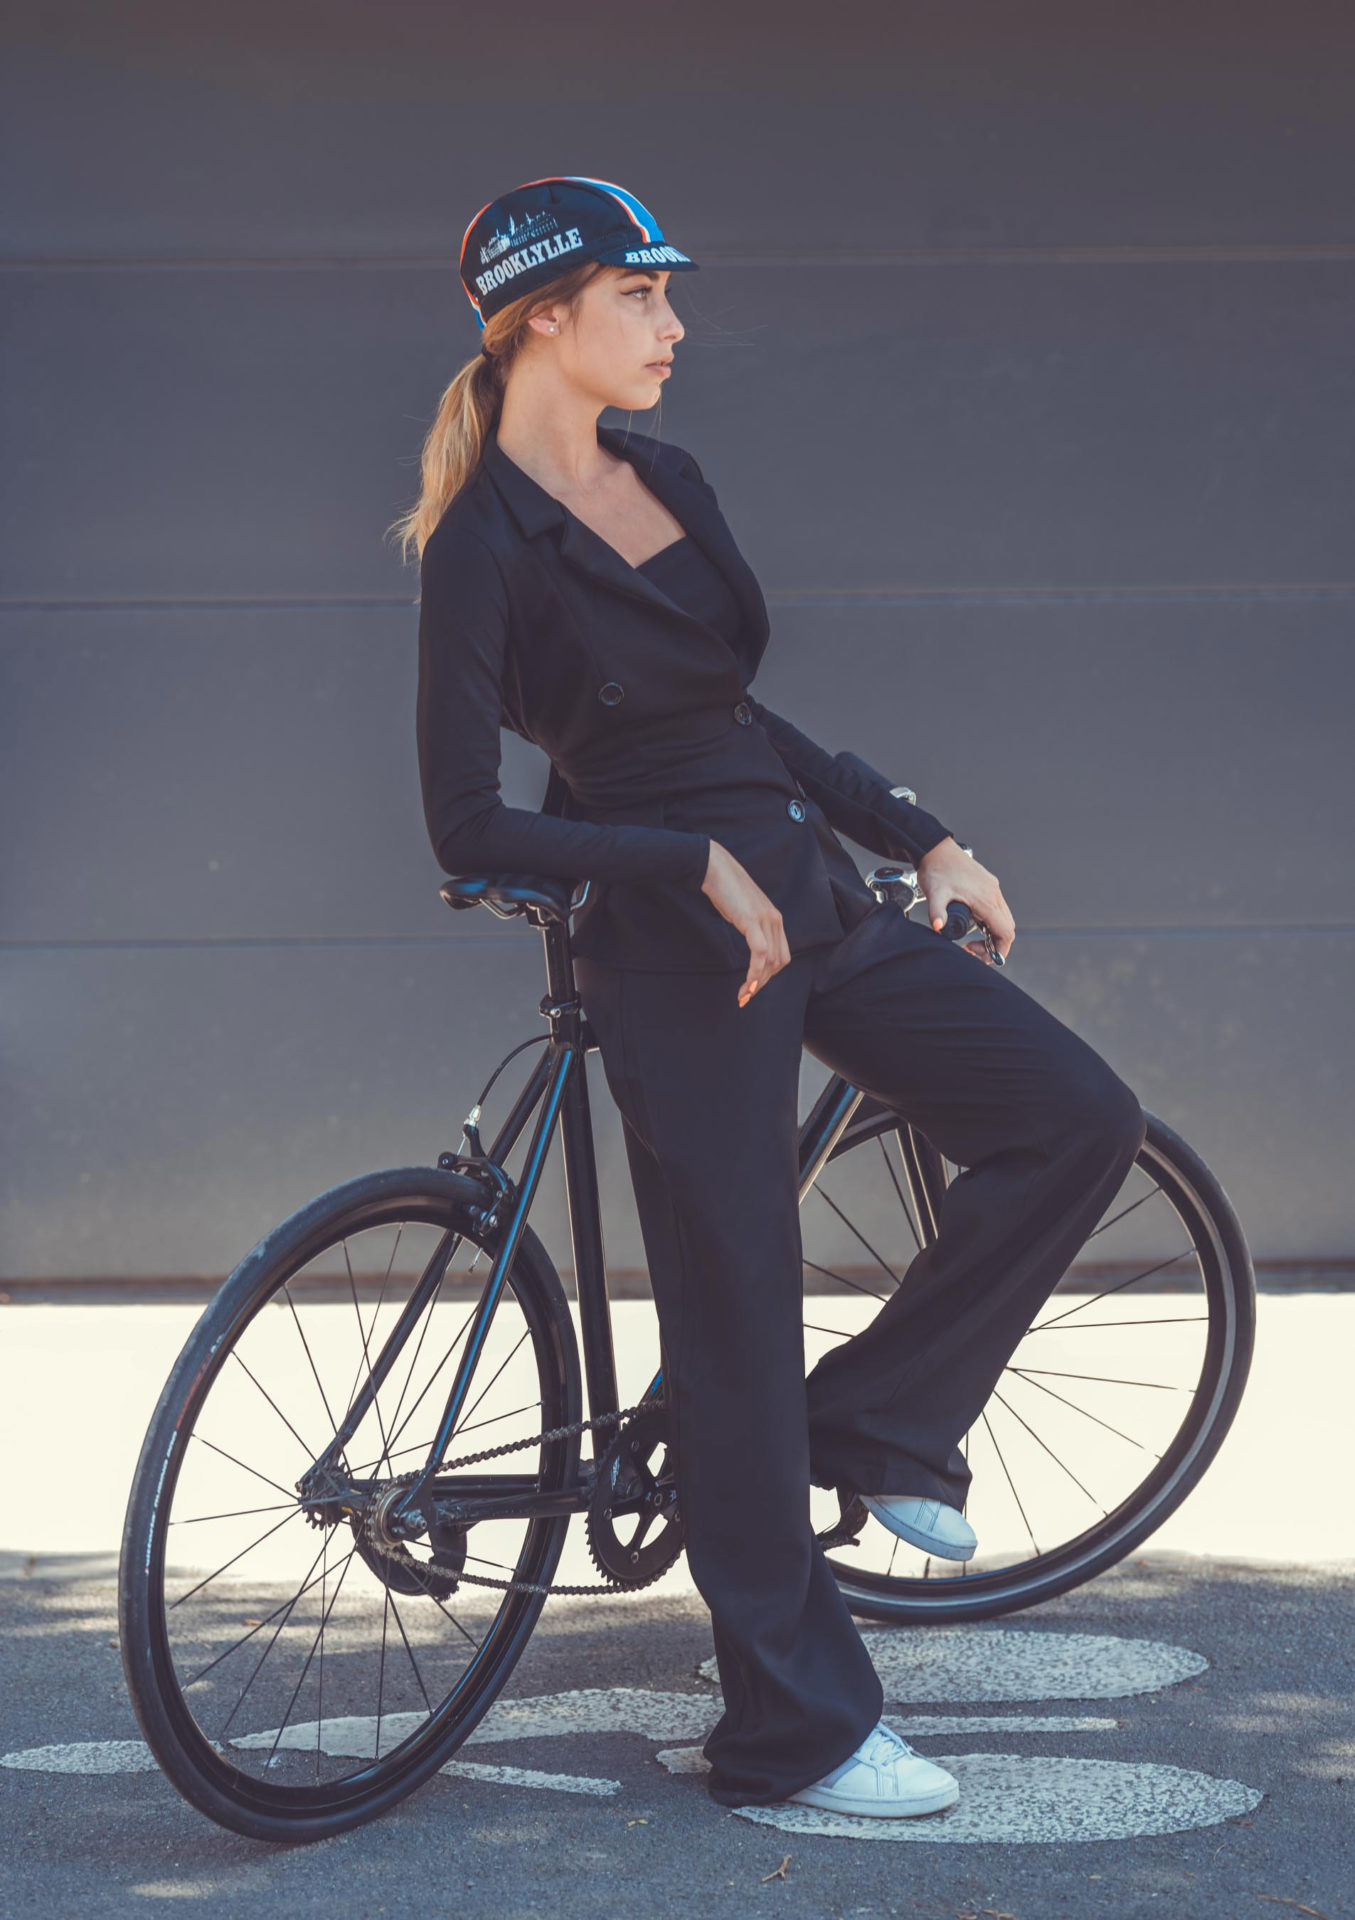 photographe-mode-Lillois-Laurent-Scavone